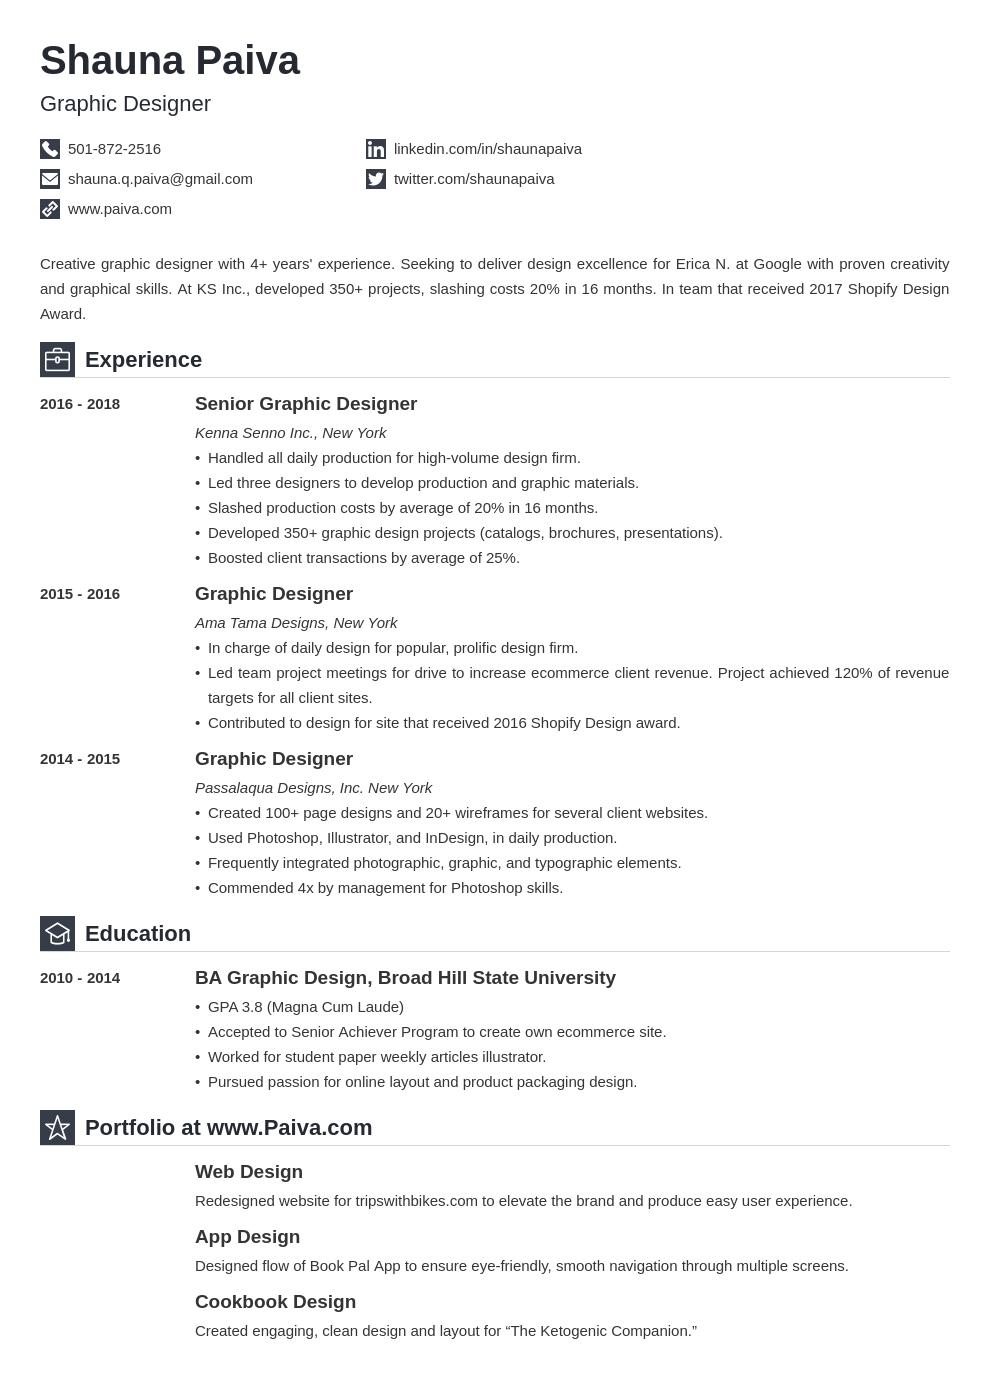 resume look template iconic uk